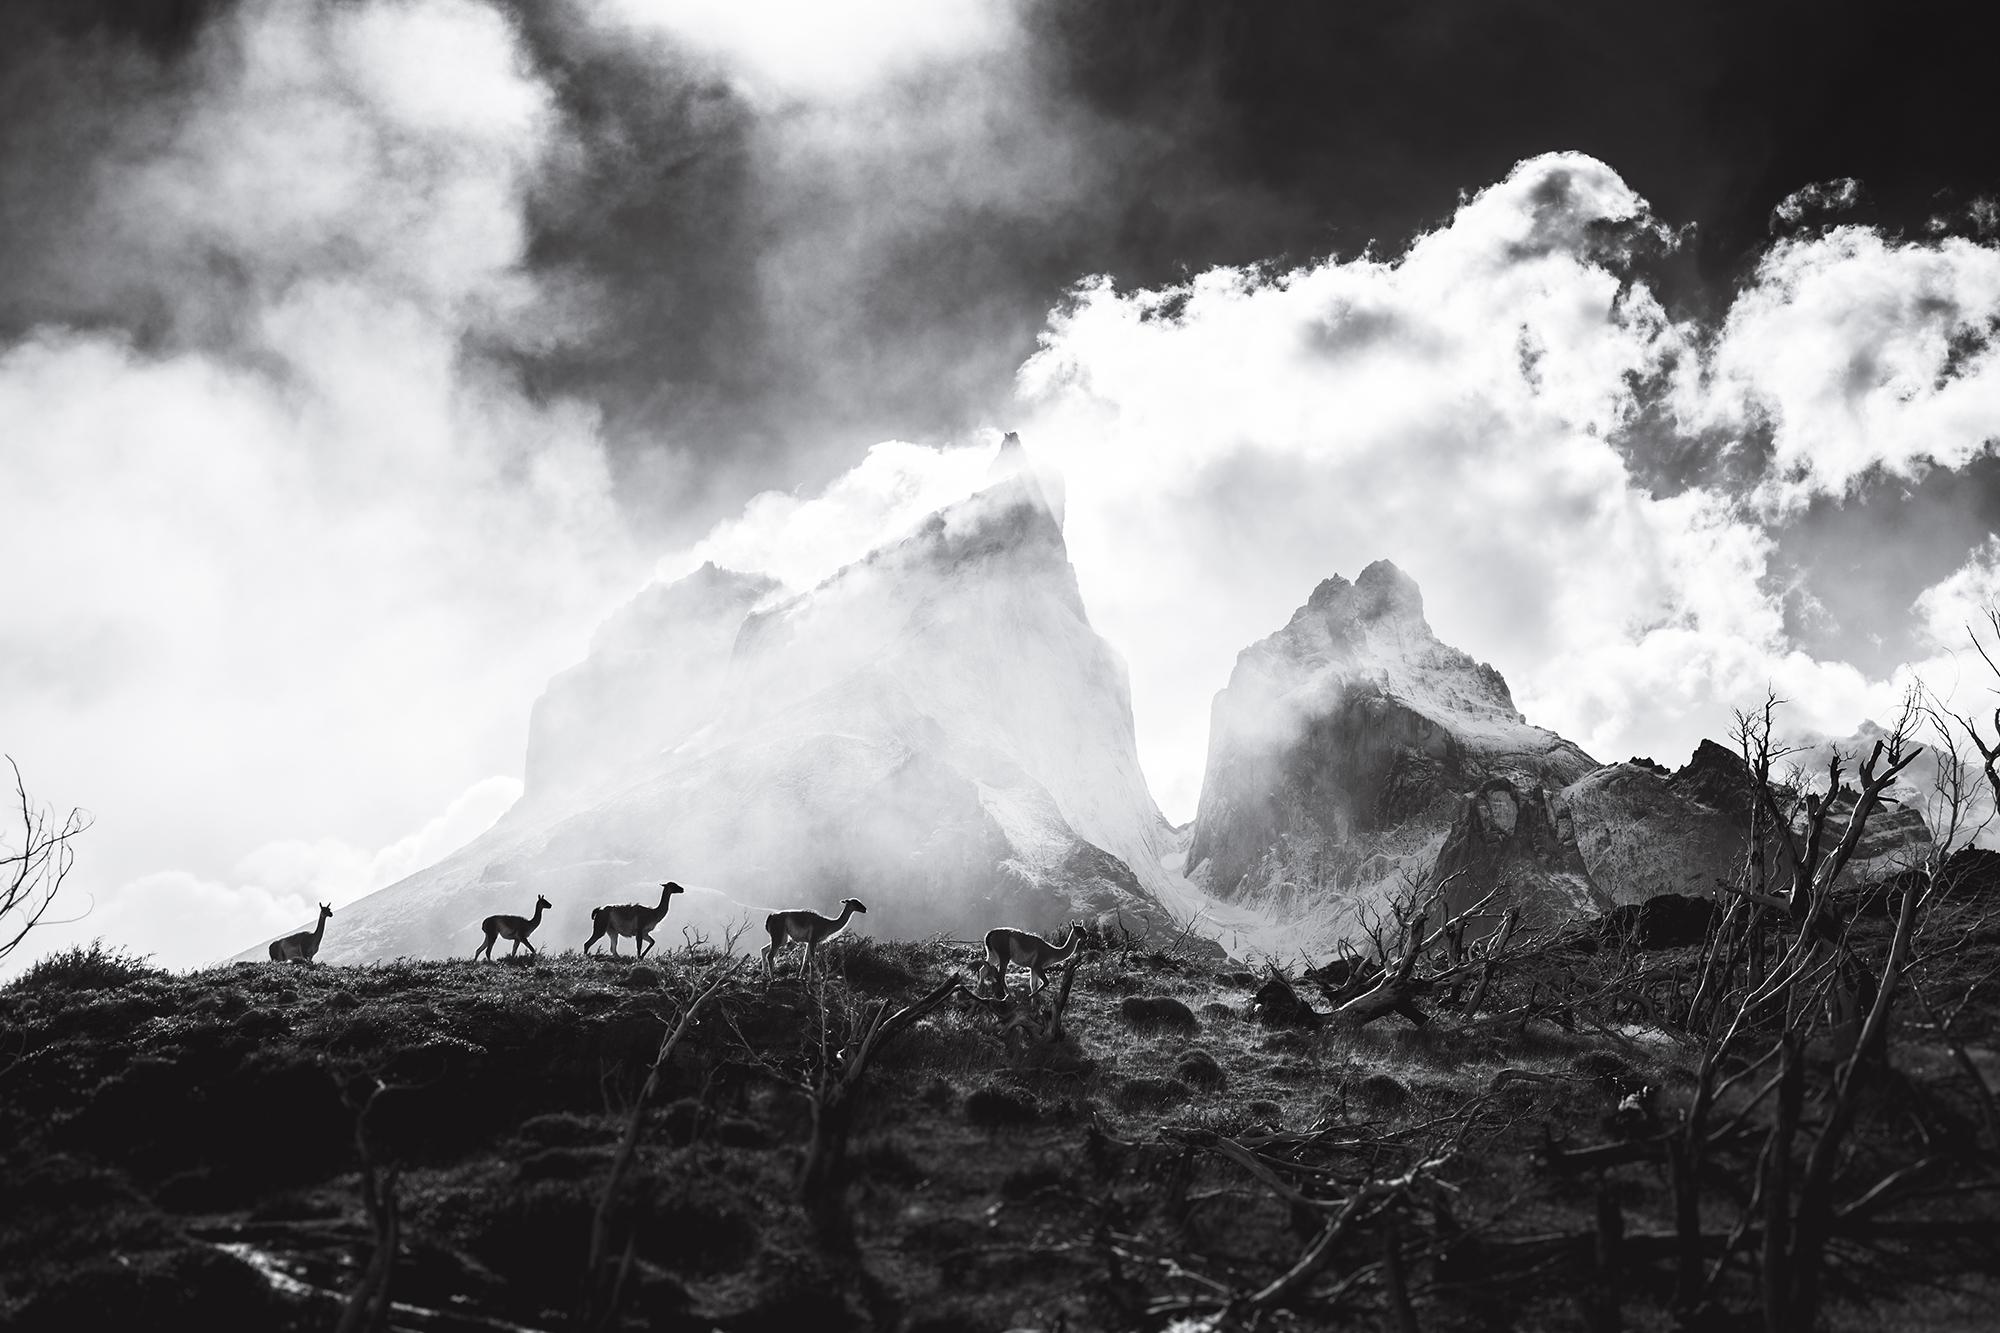 IMG_0186-patagonie-chili-sophie-narses-photographe-paysage-monde-annecy-tirages-voyage-art